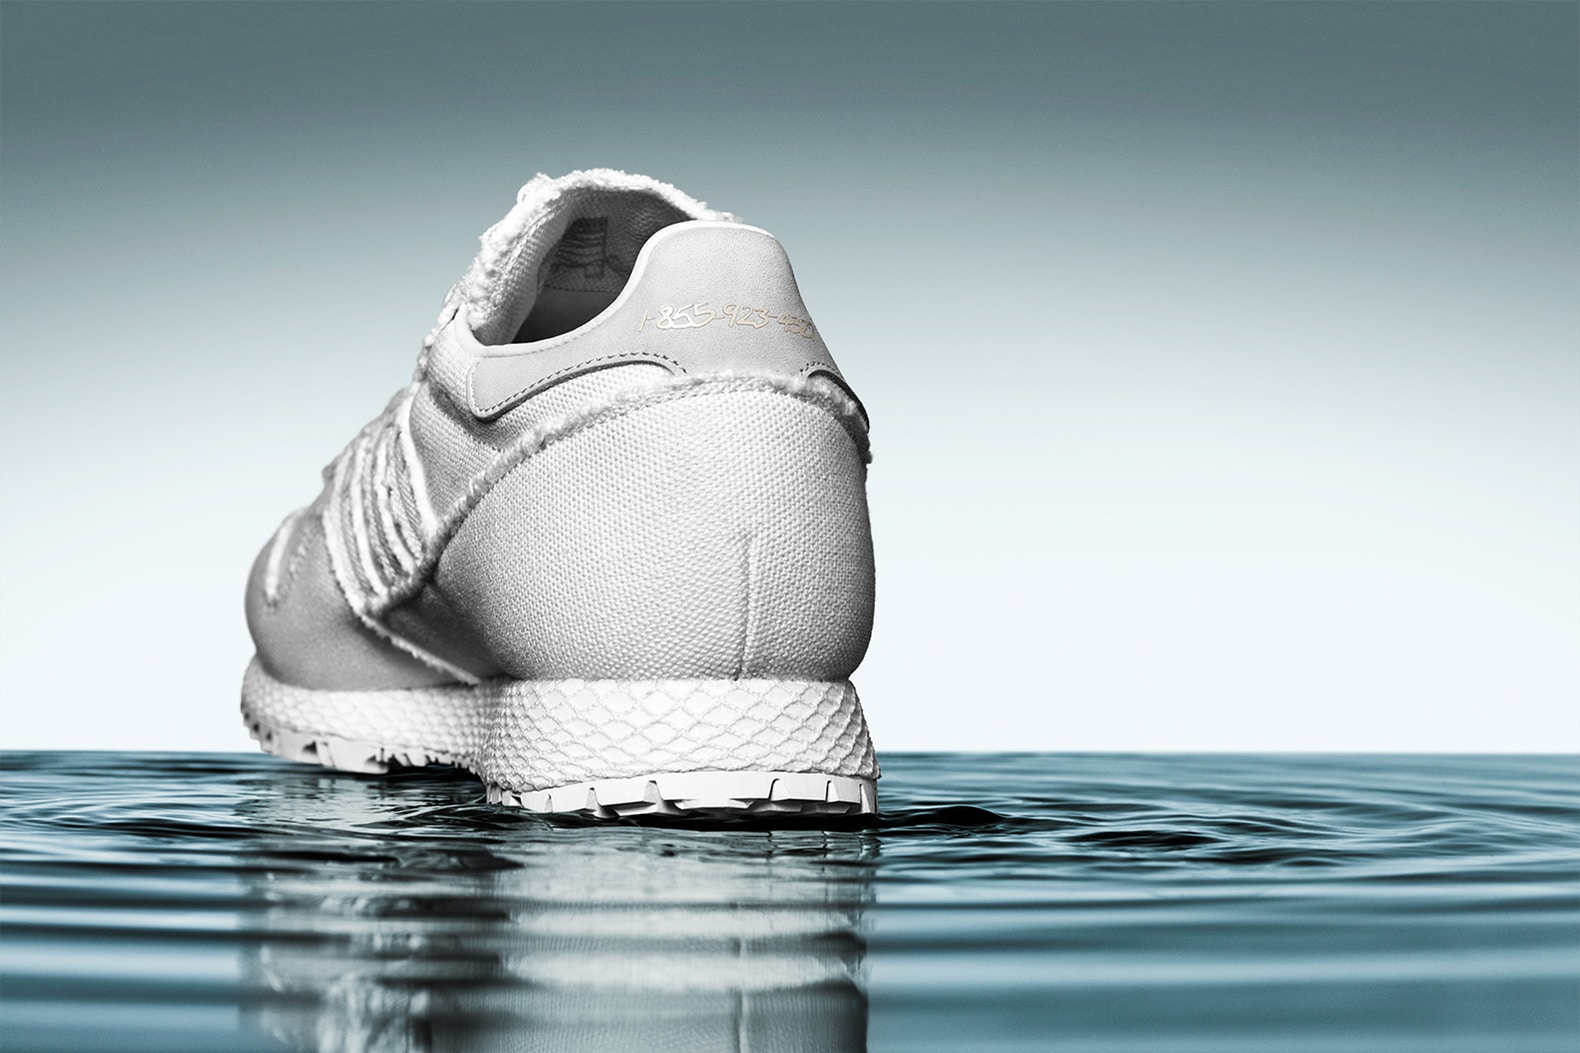 http---hypebeast.com-image-2017-07-daniel-arsham-adidas-originals-new-york-3